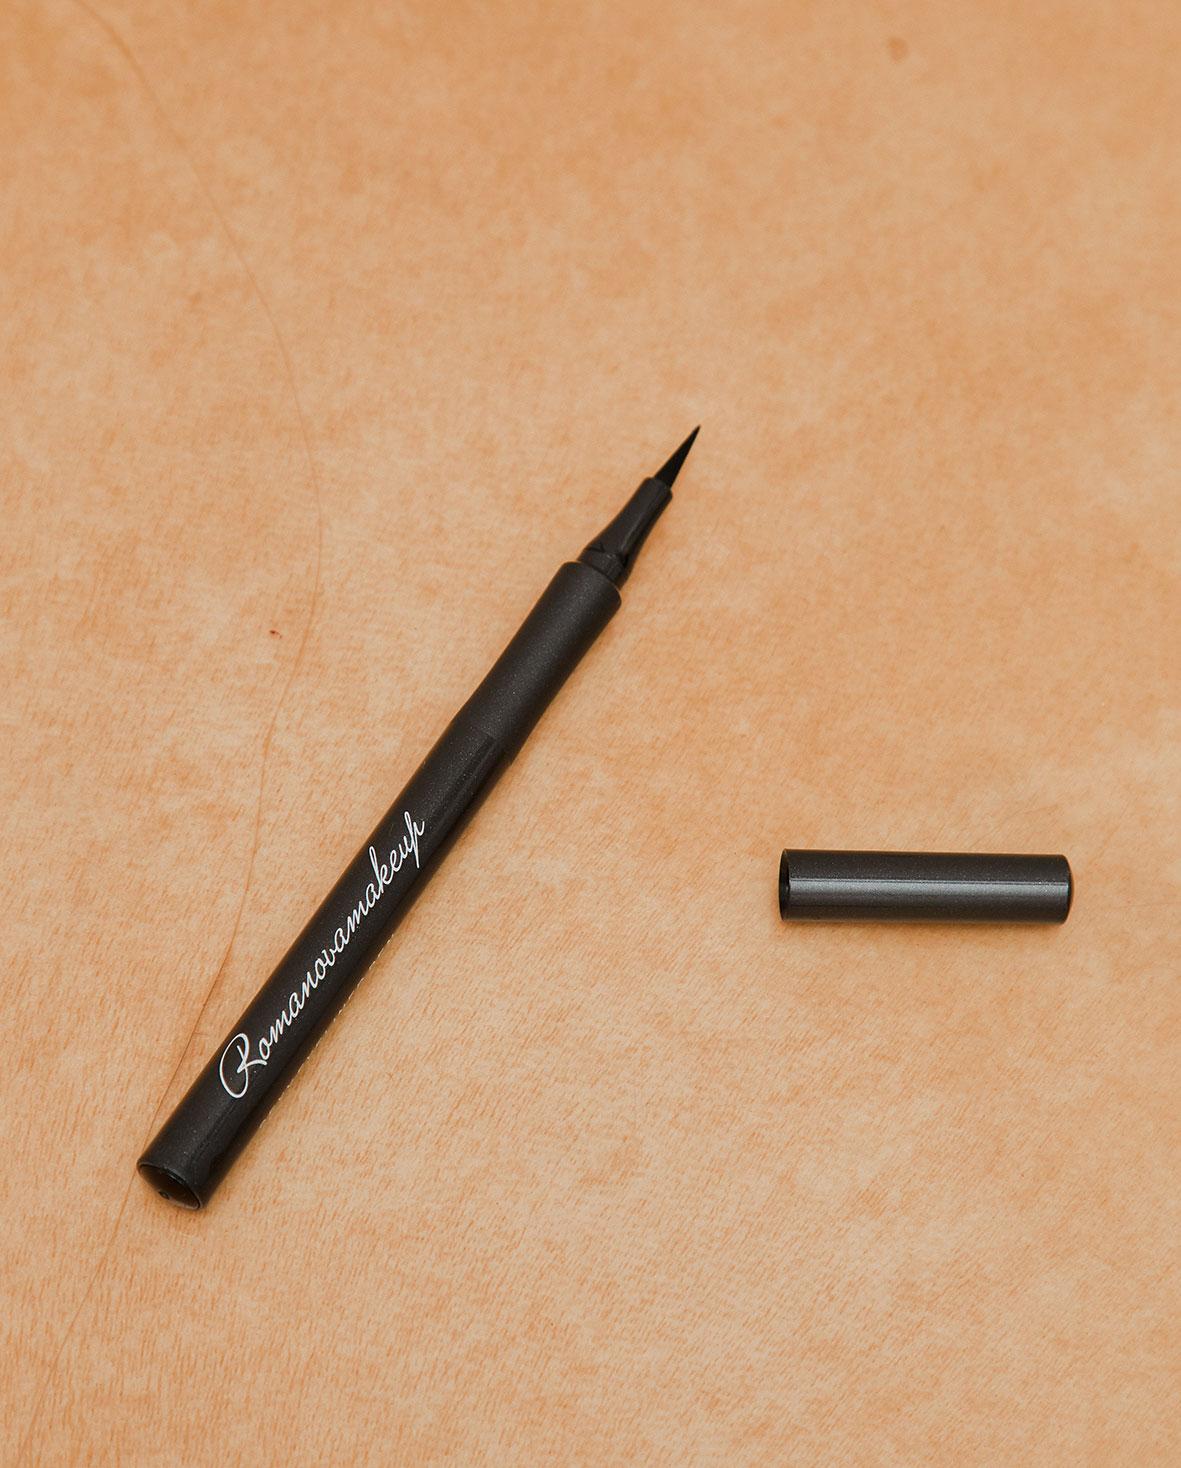 Sexy Eyeliner Pen, Romanovamakeup